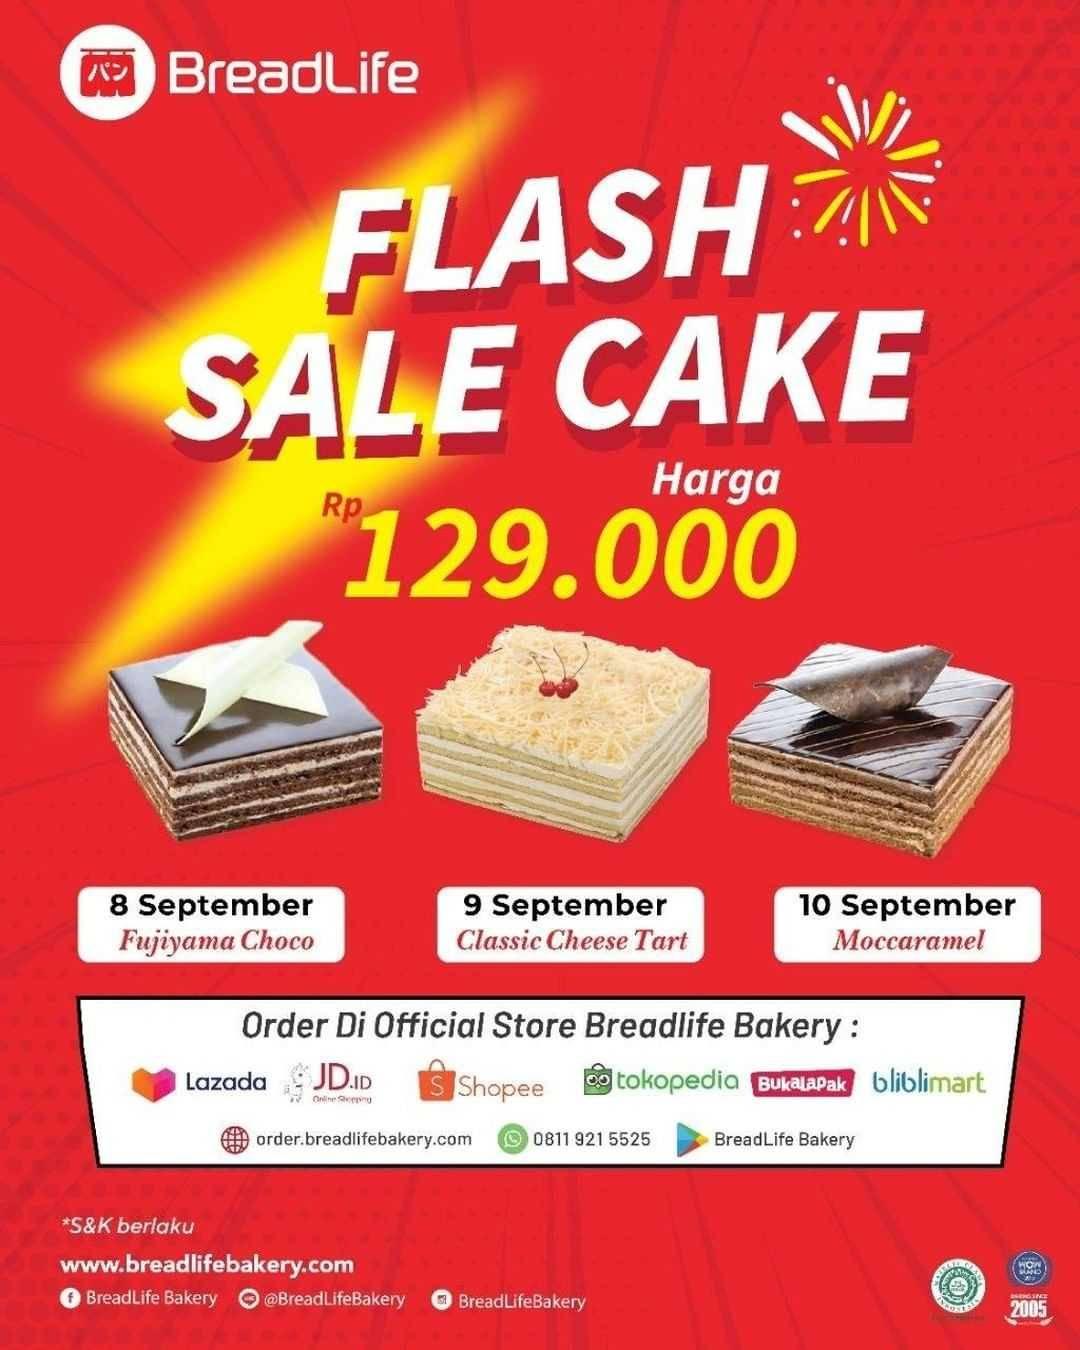 Promo diskon Breadlife Flash Sale Cake Hanya Rp. 129.000